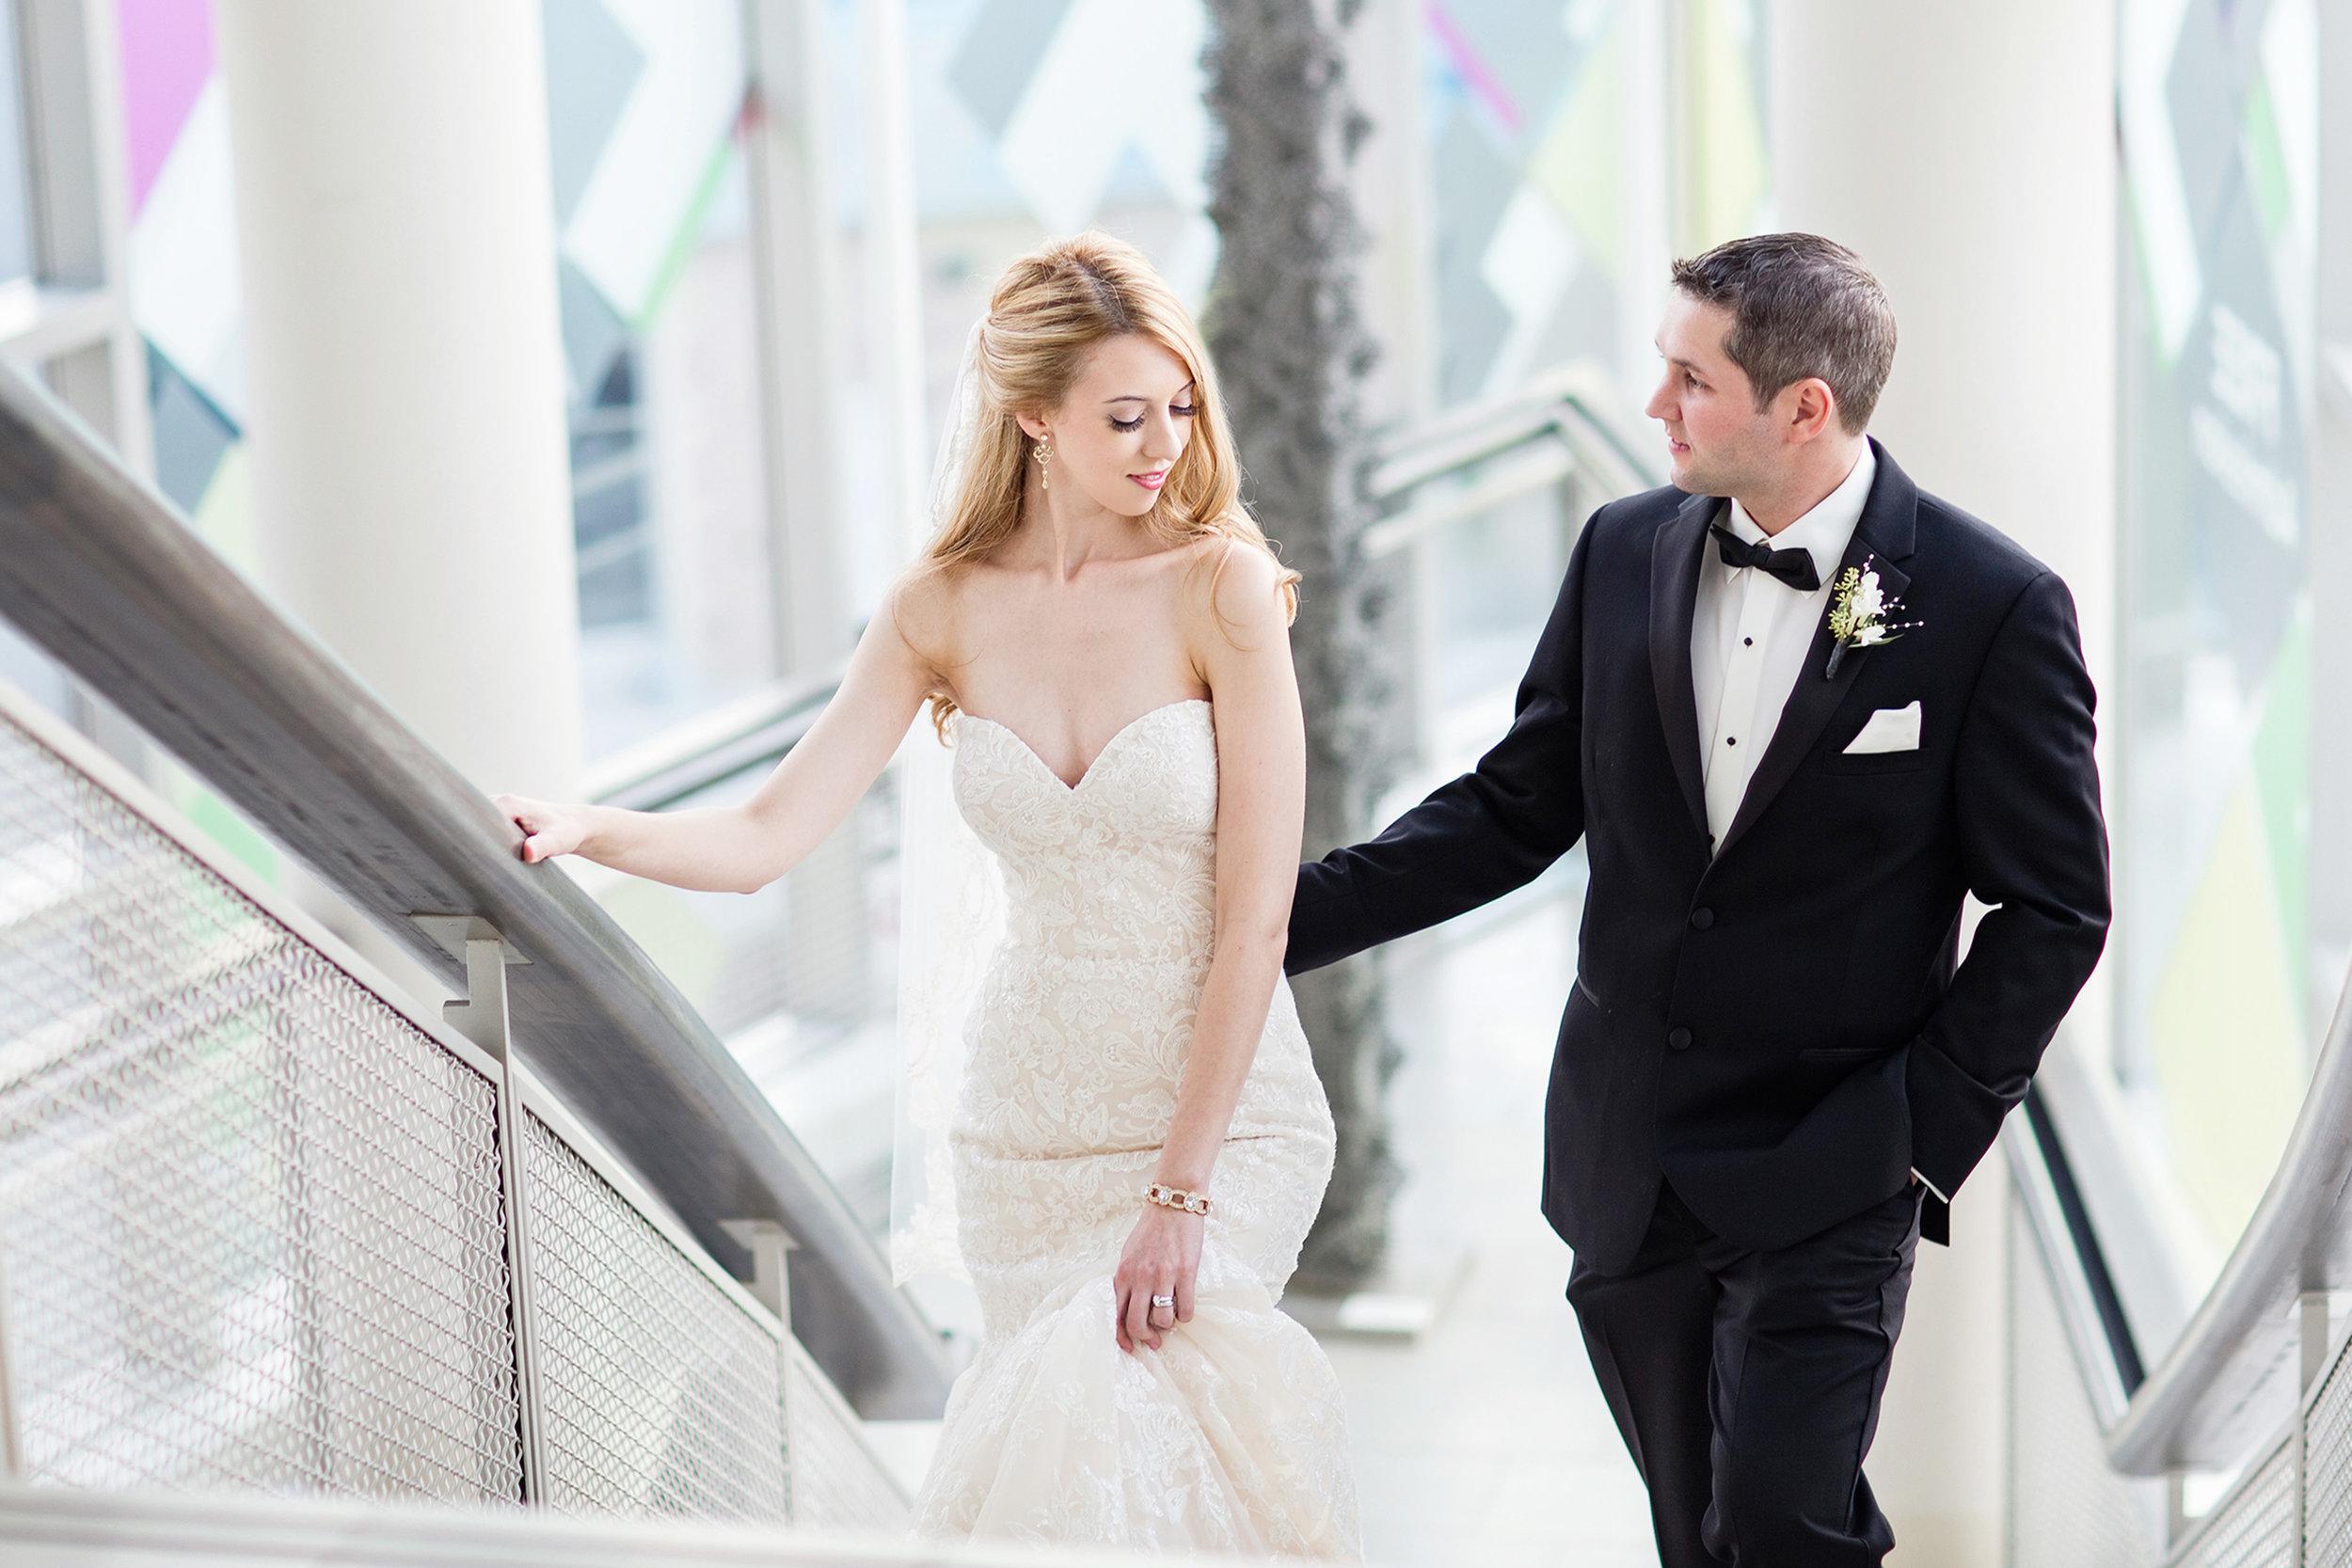 stylish-wedding-photography-windsor-toronto-ontario-wedding-photographer-winery-eryn-shea-photography-26.jpg